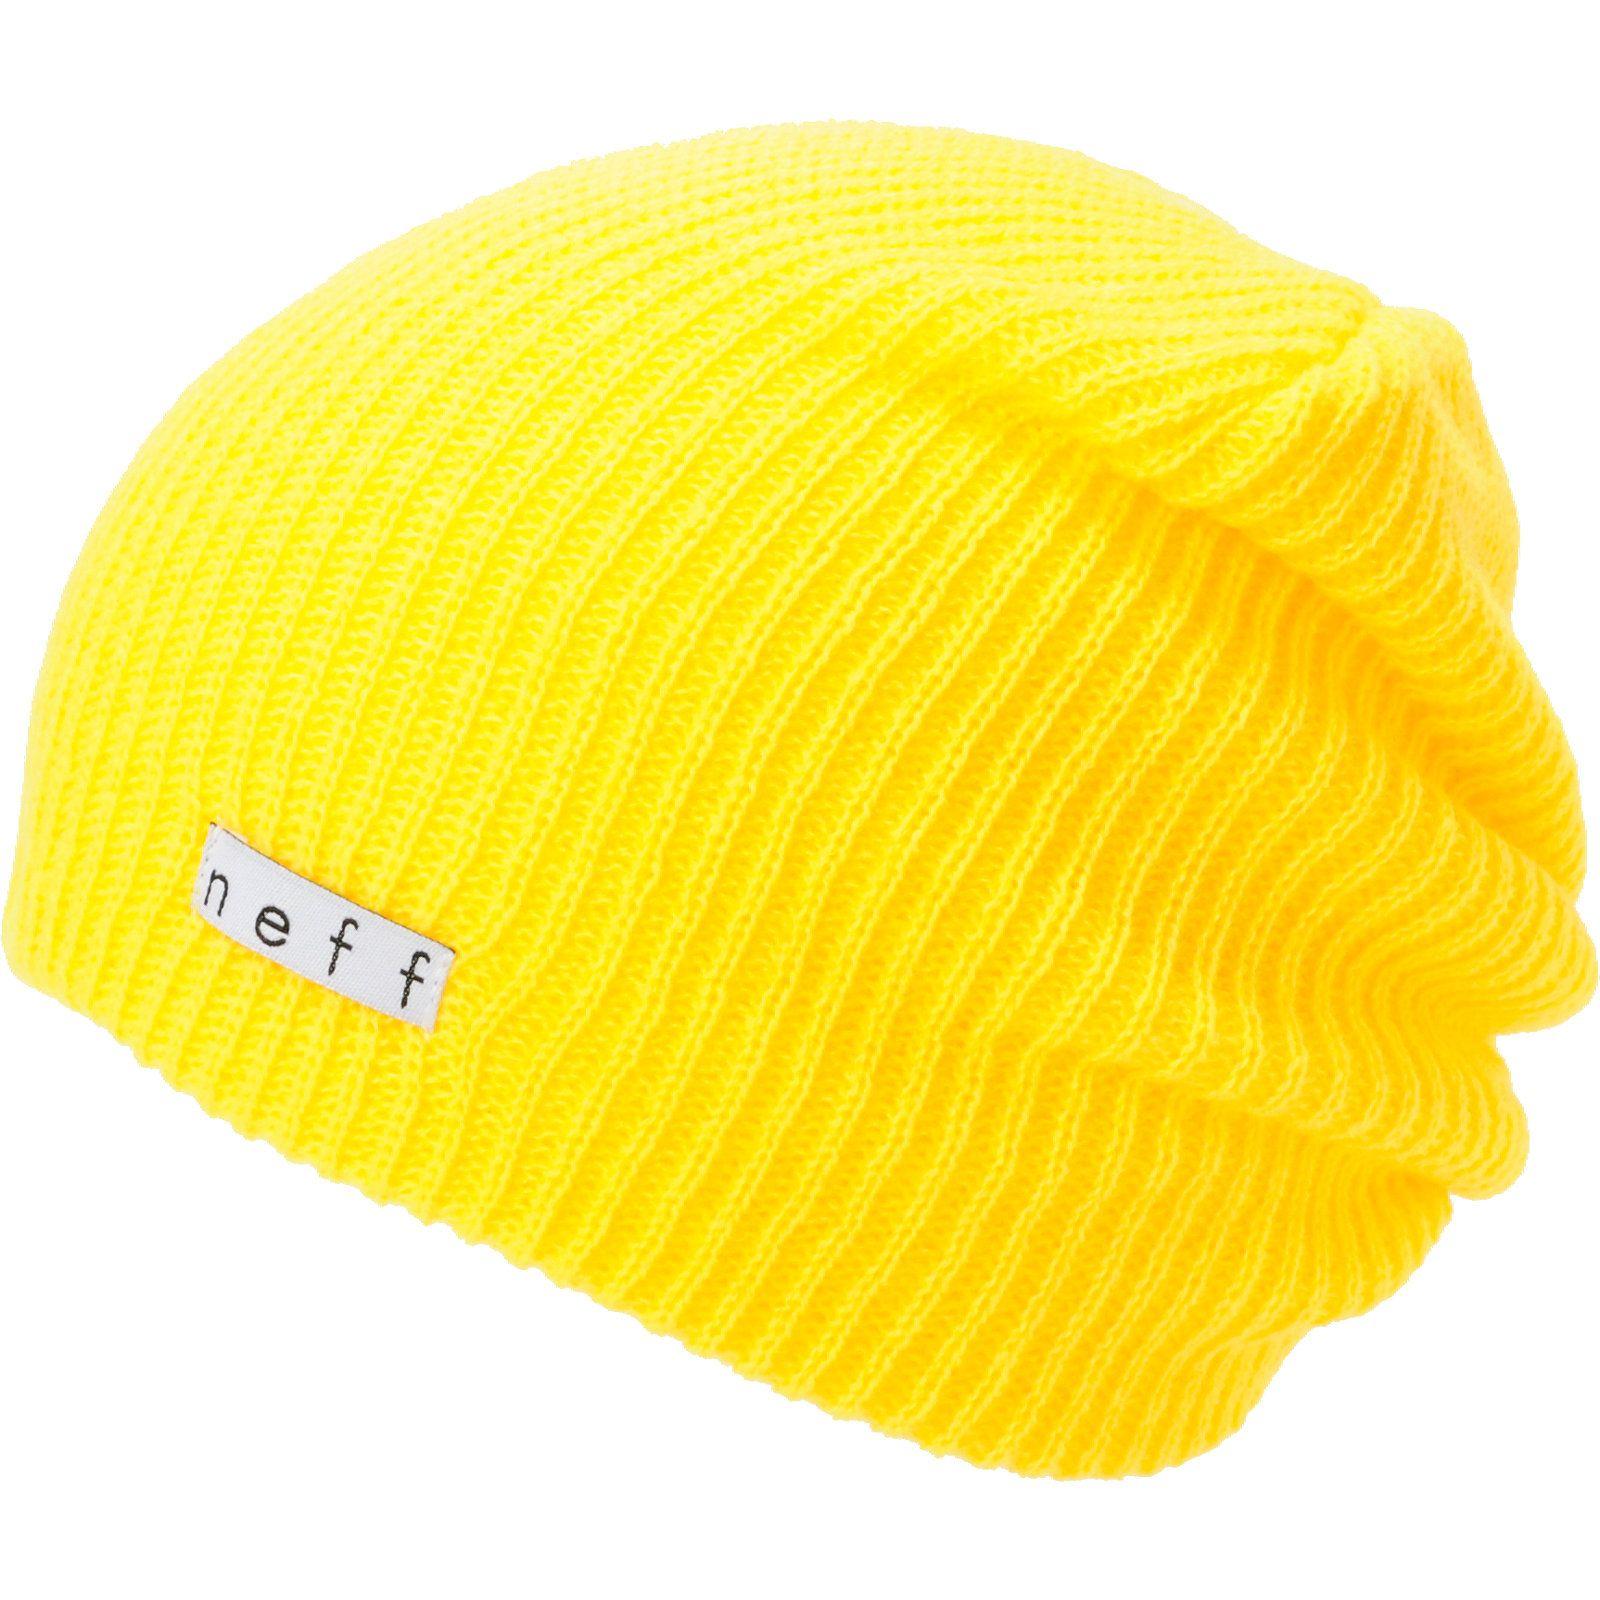 9f696c1d49a Neff Daily Yellow Beanie